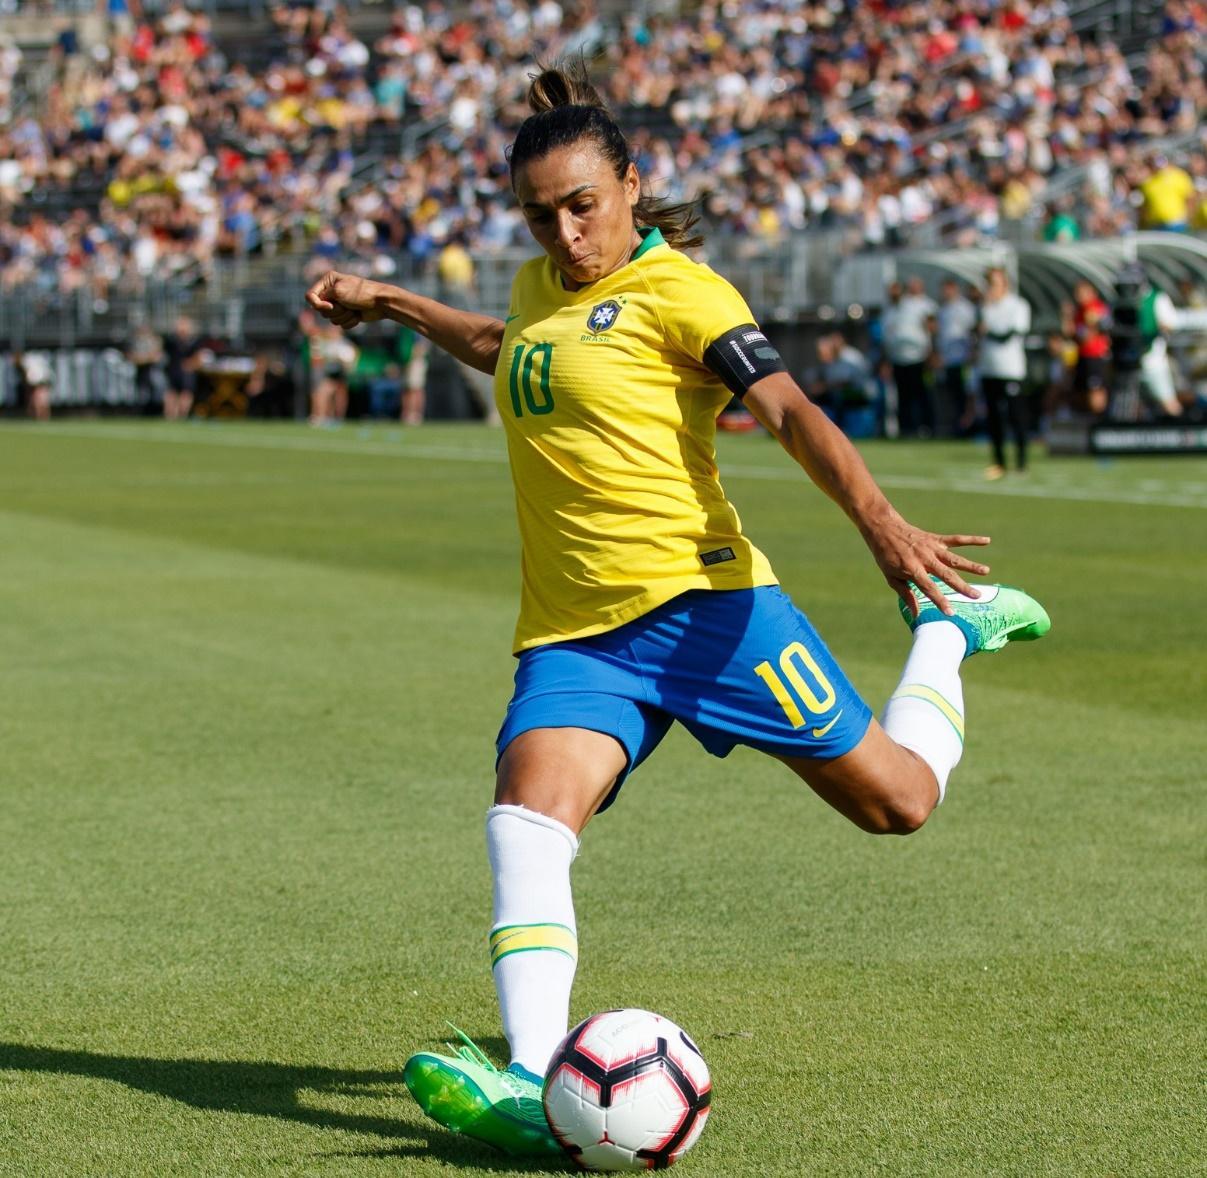 File:Marta Brazil.jpg - Wikimedia Commons